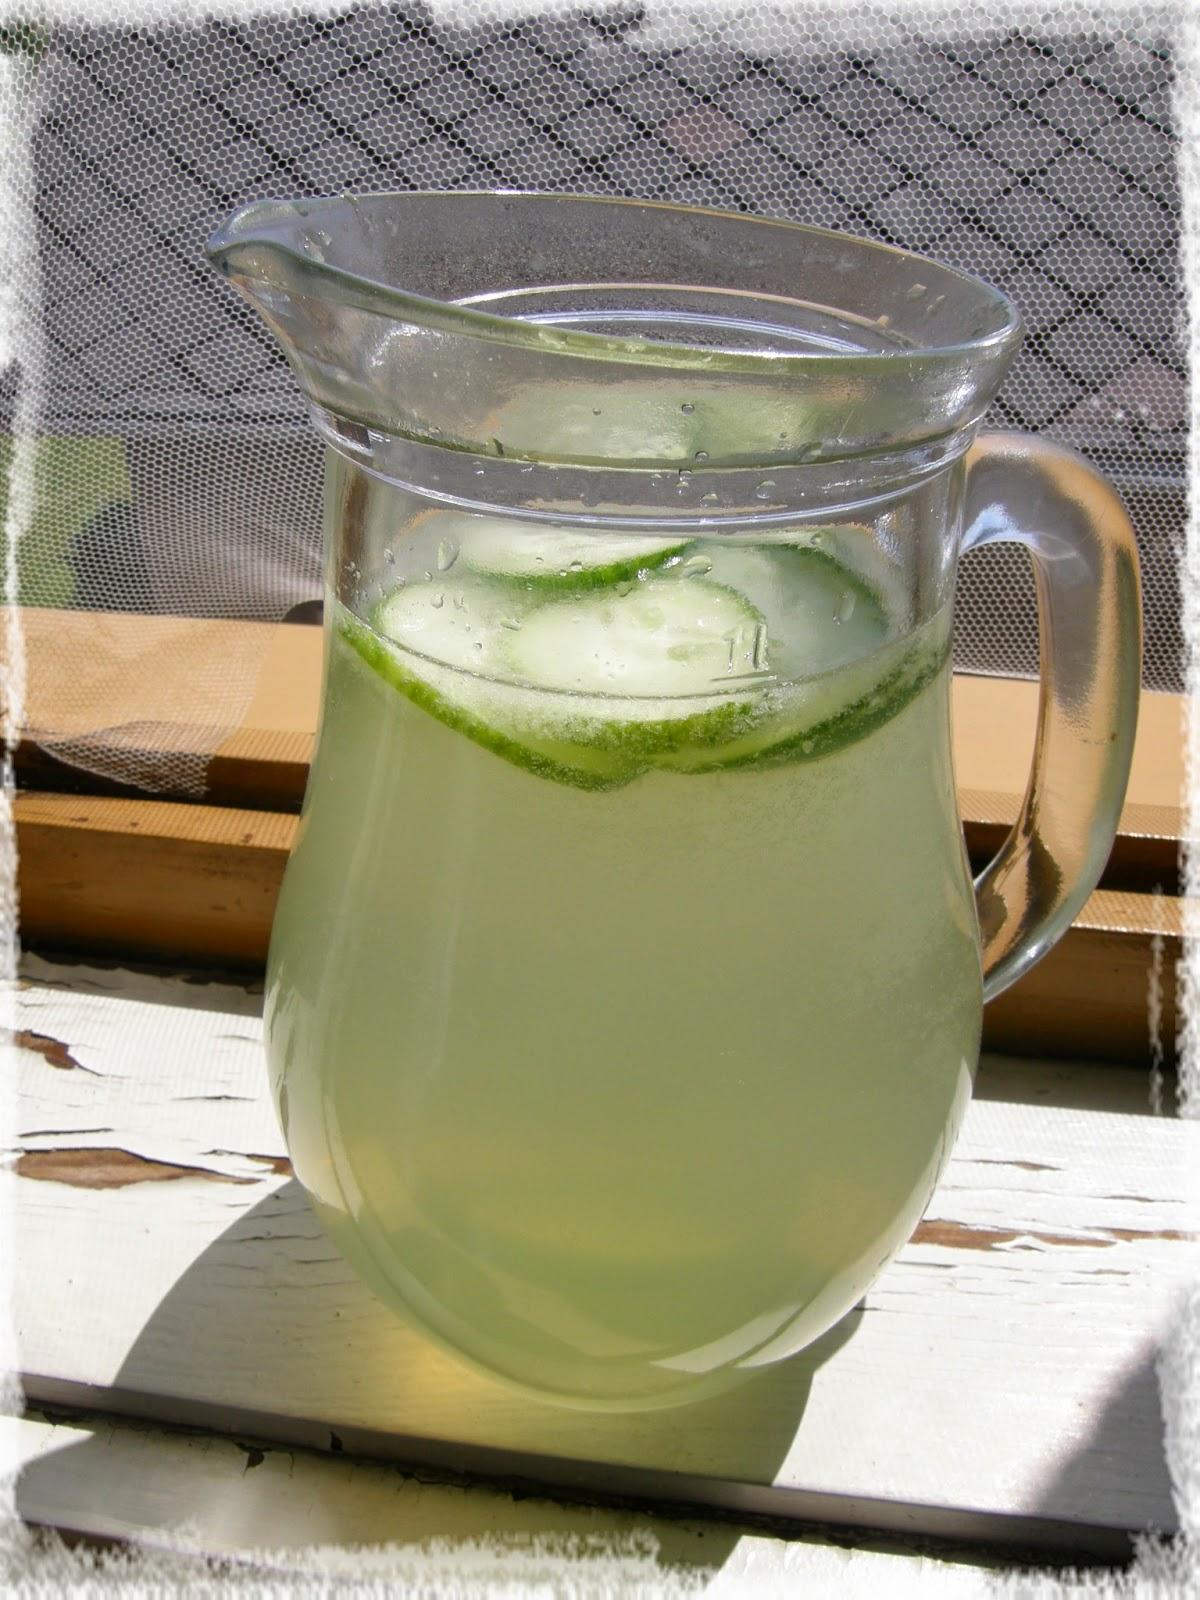 okurková limonáda v džbánu, cucumber limonade